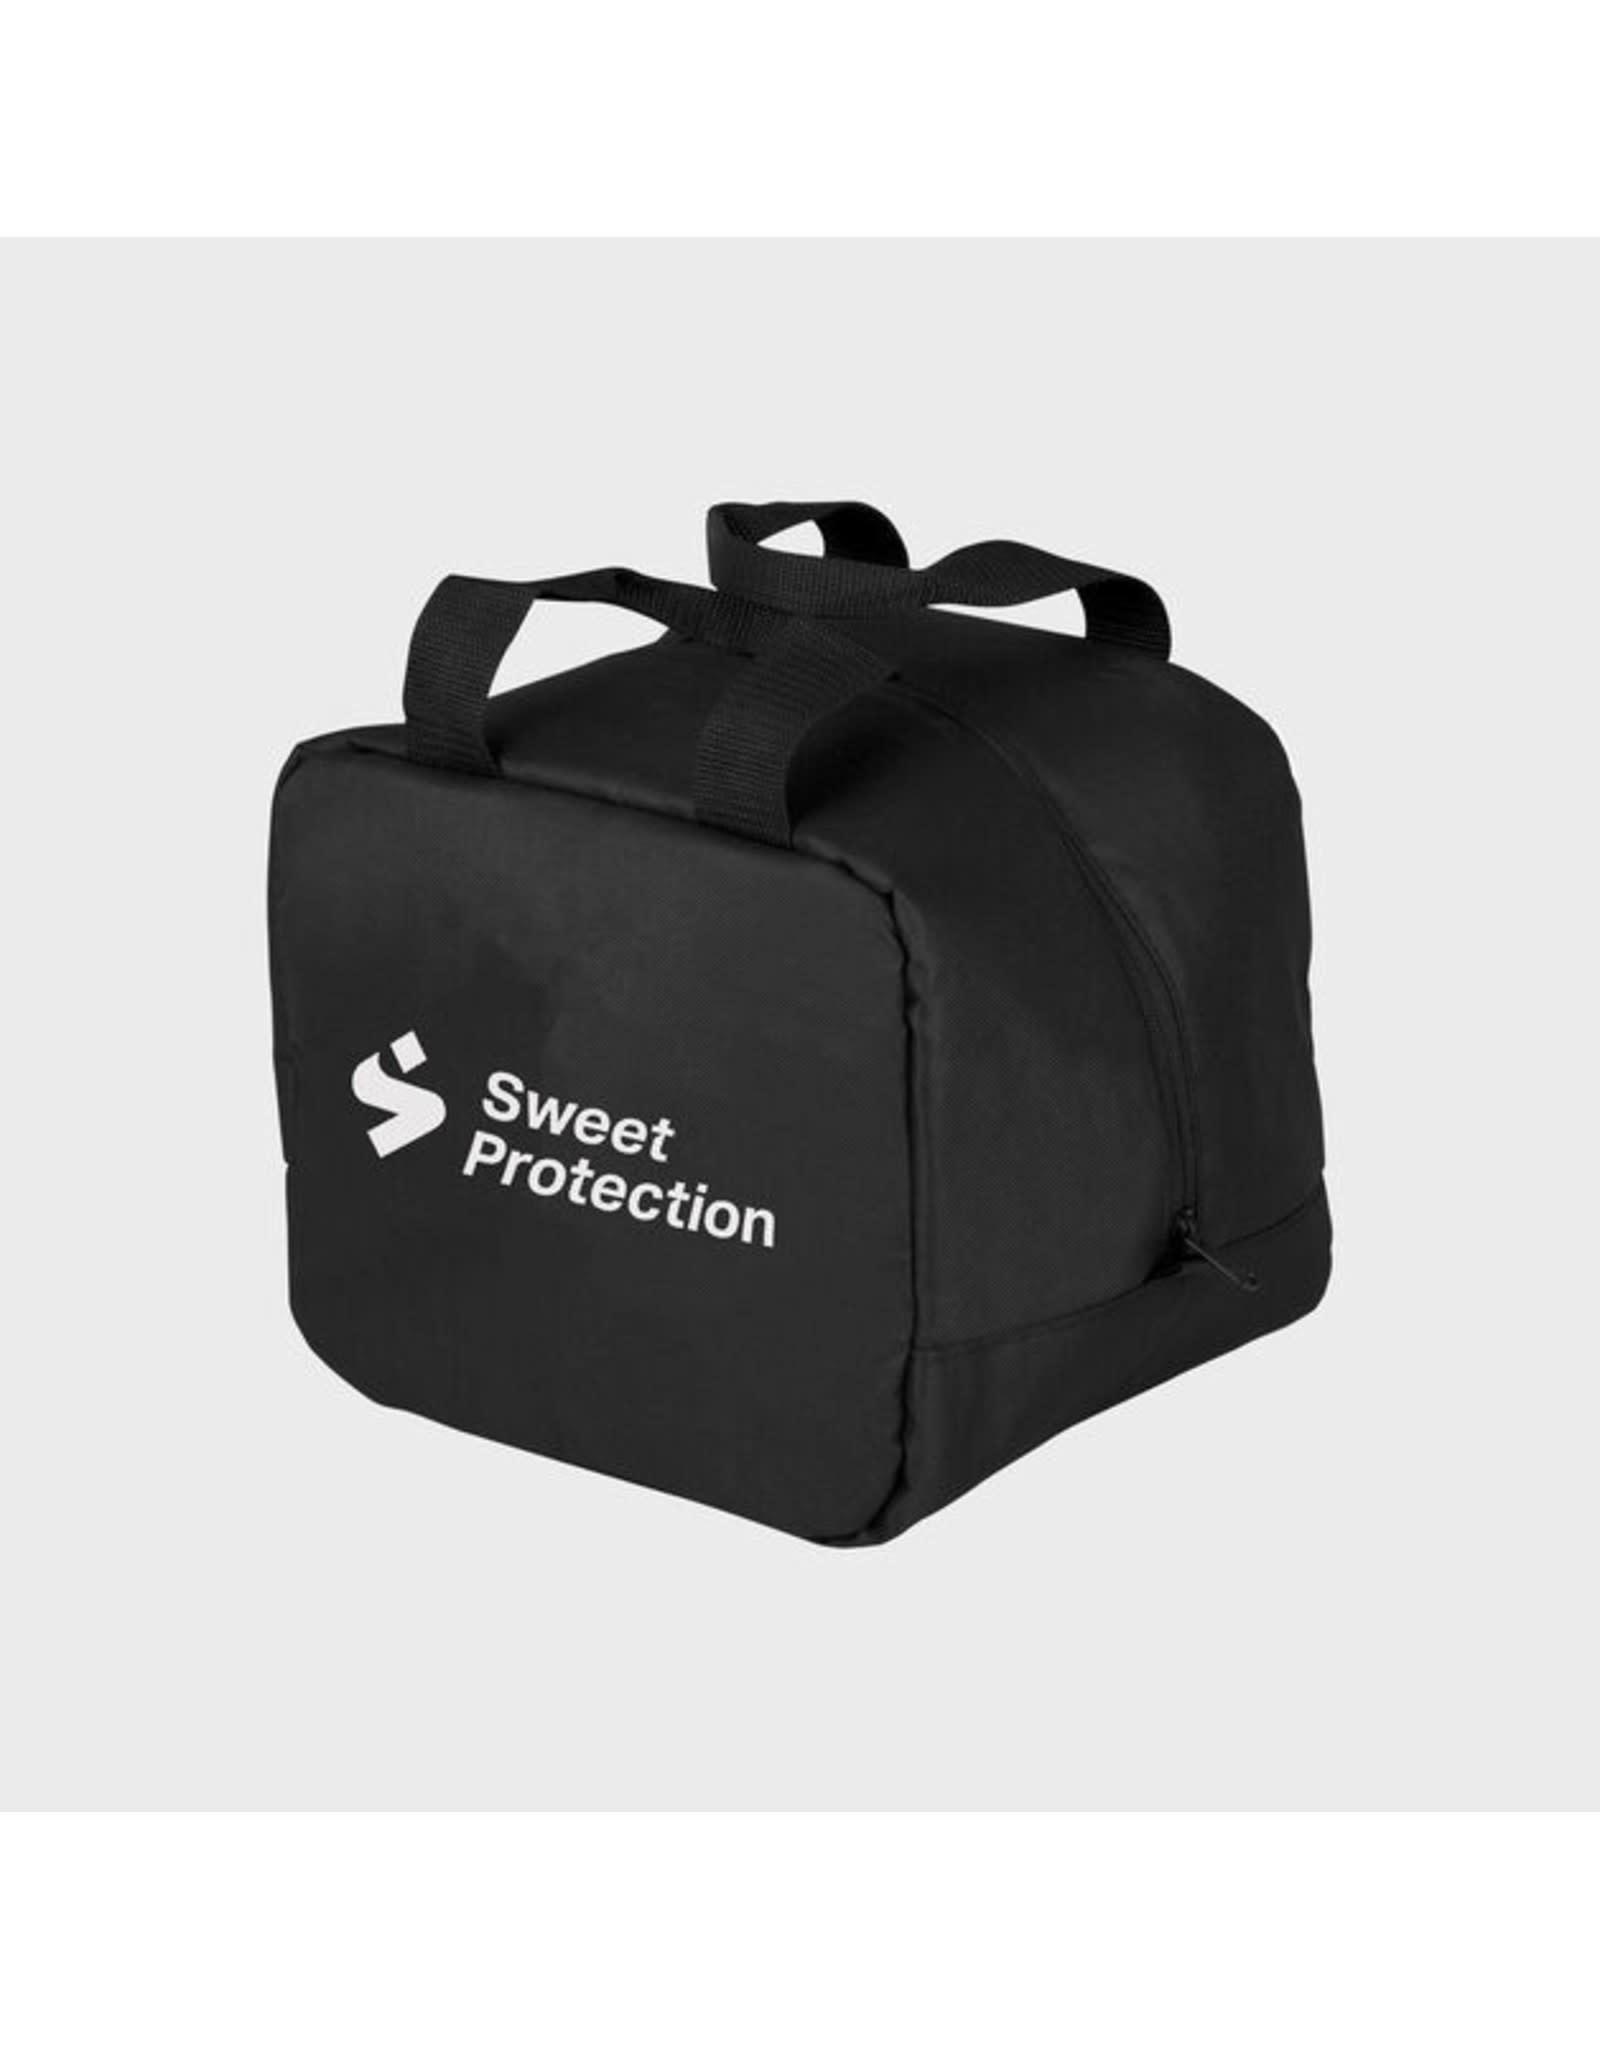 Sweet Protection Helmet Bag Universal Sweep Protection